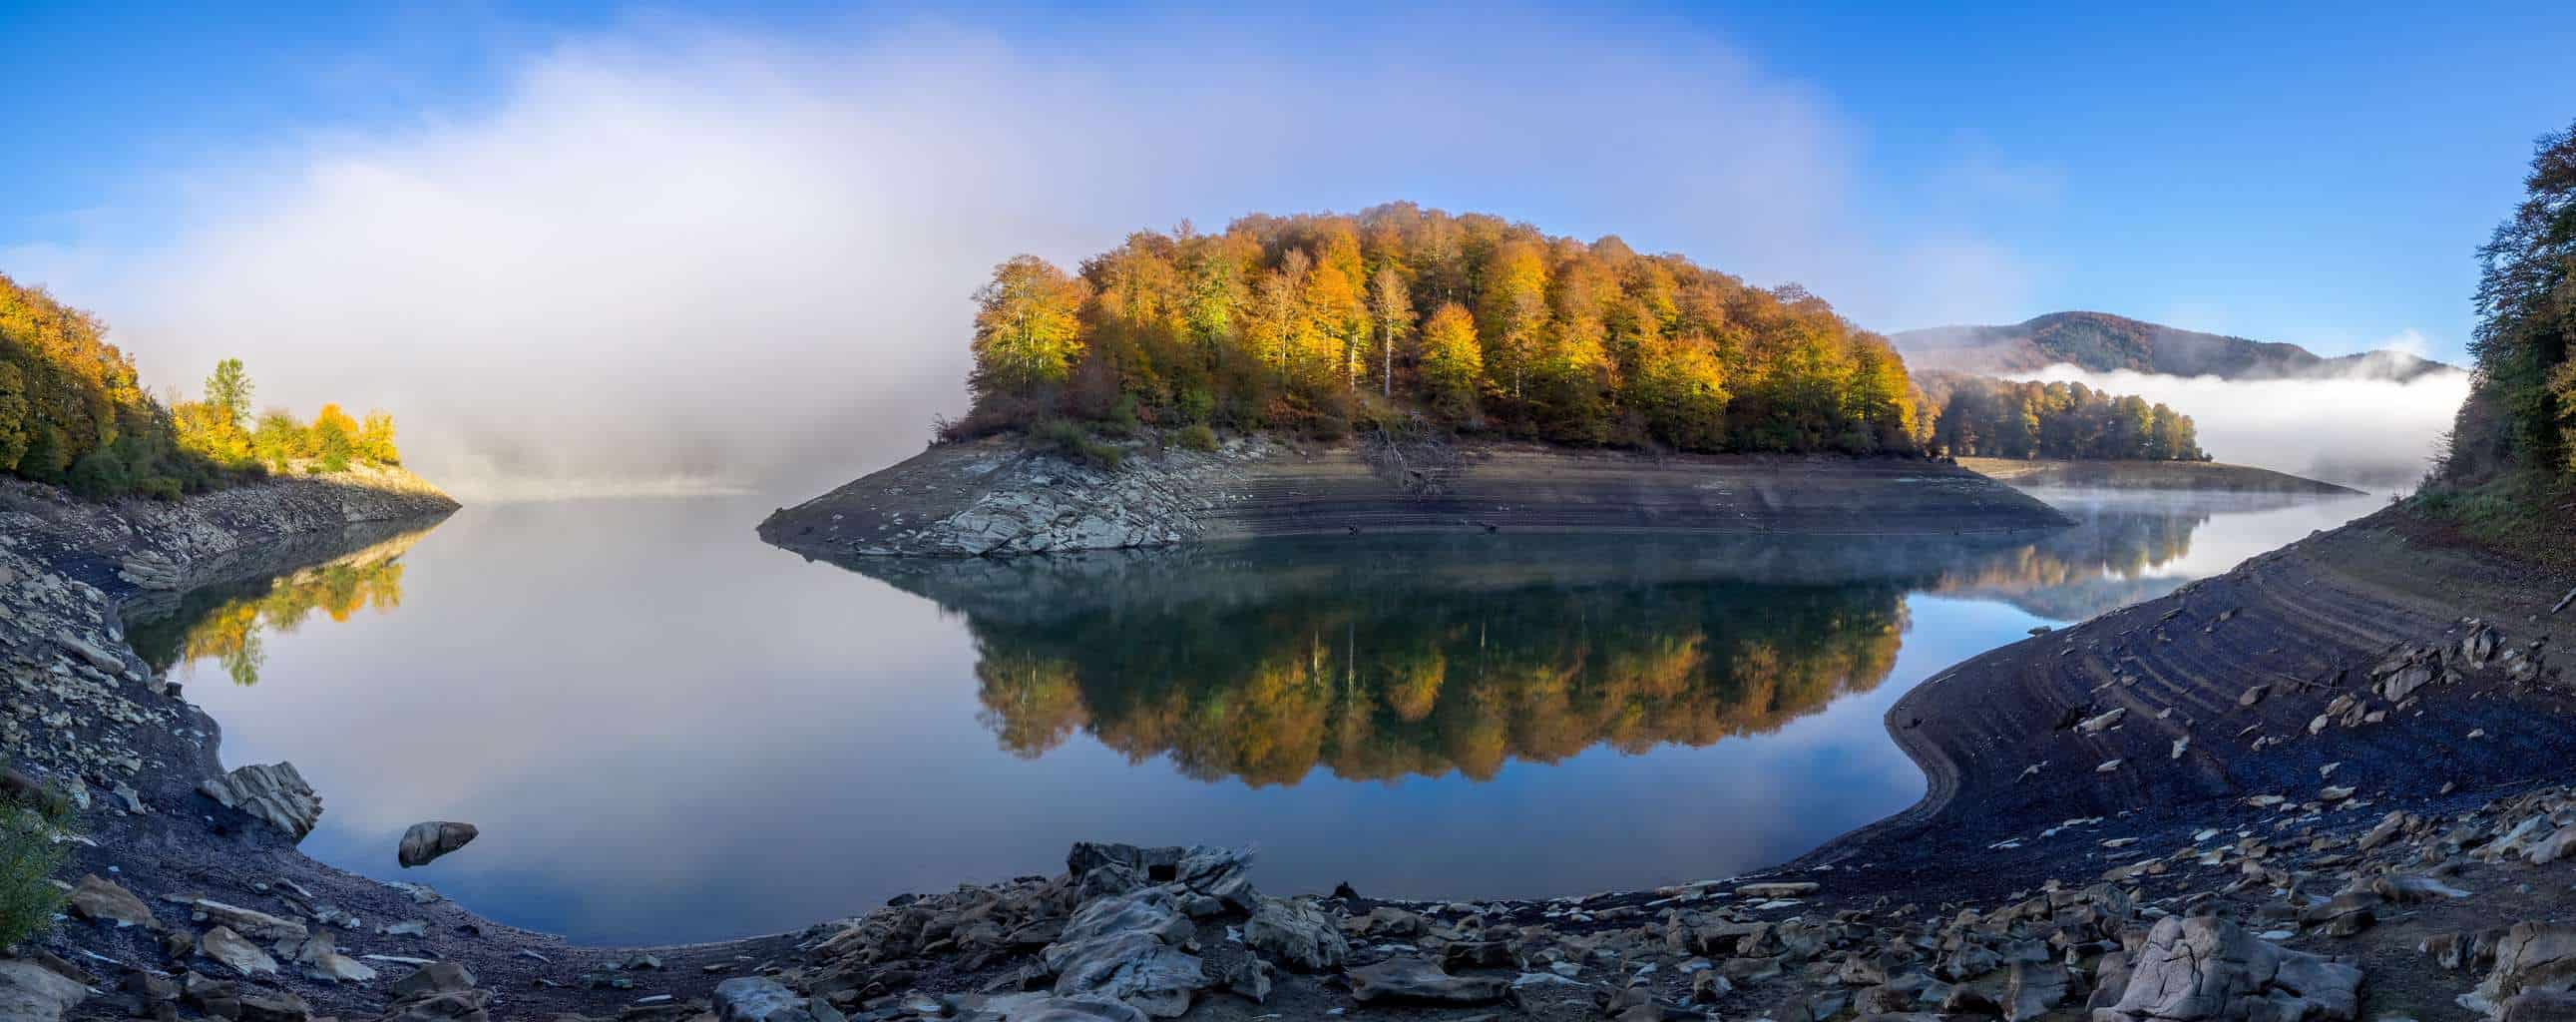 Guía turística de la Selva de Irati